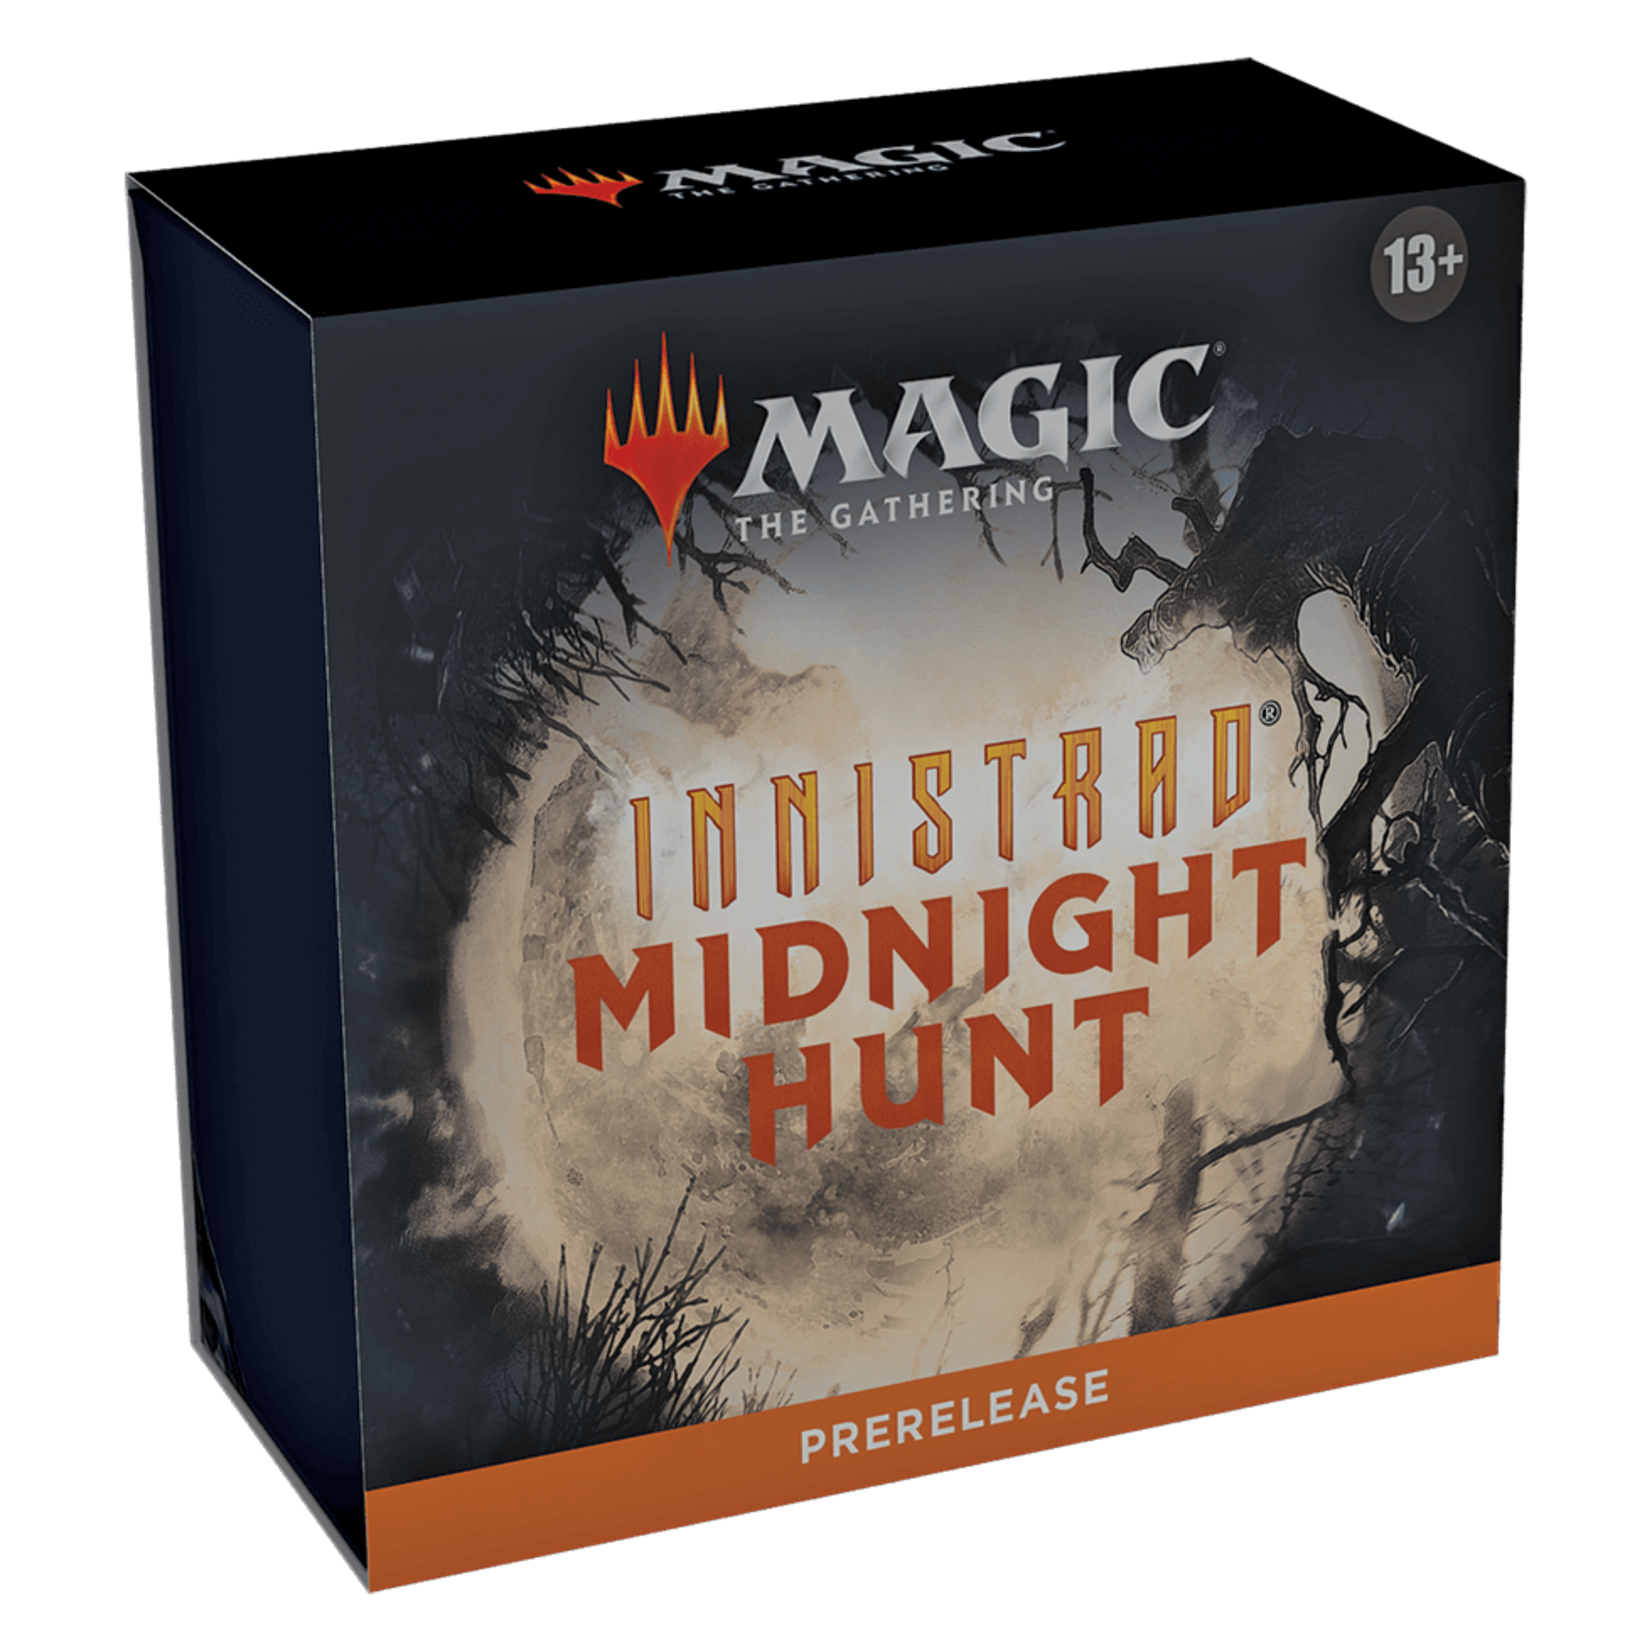 Wizards of the Coast MTG: Innistrad Midnight PreRelease Kit